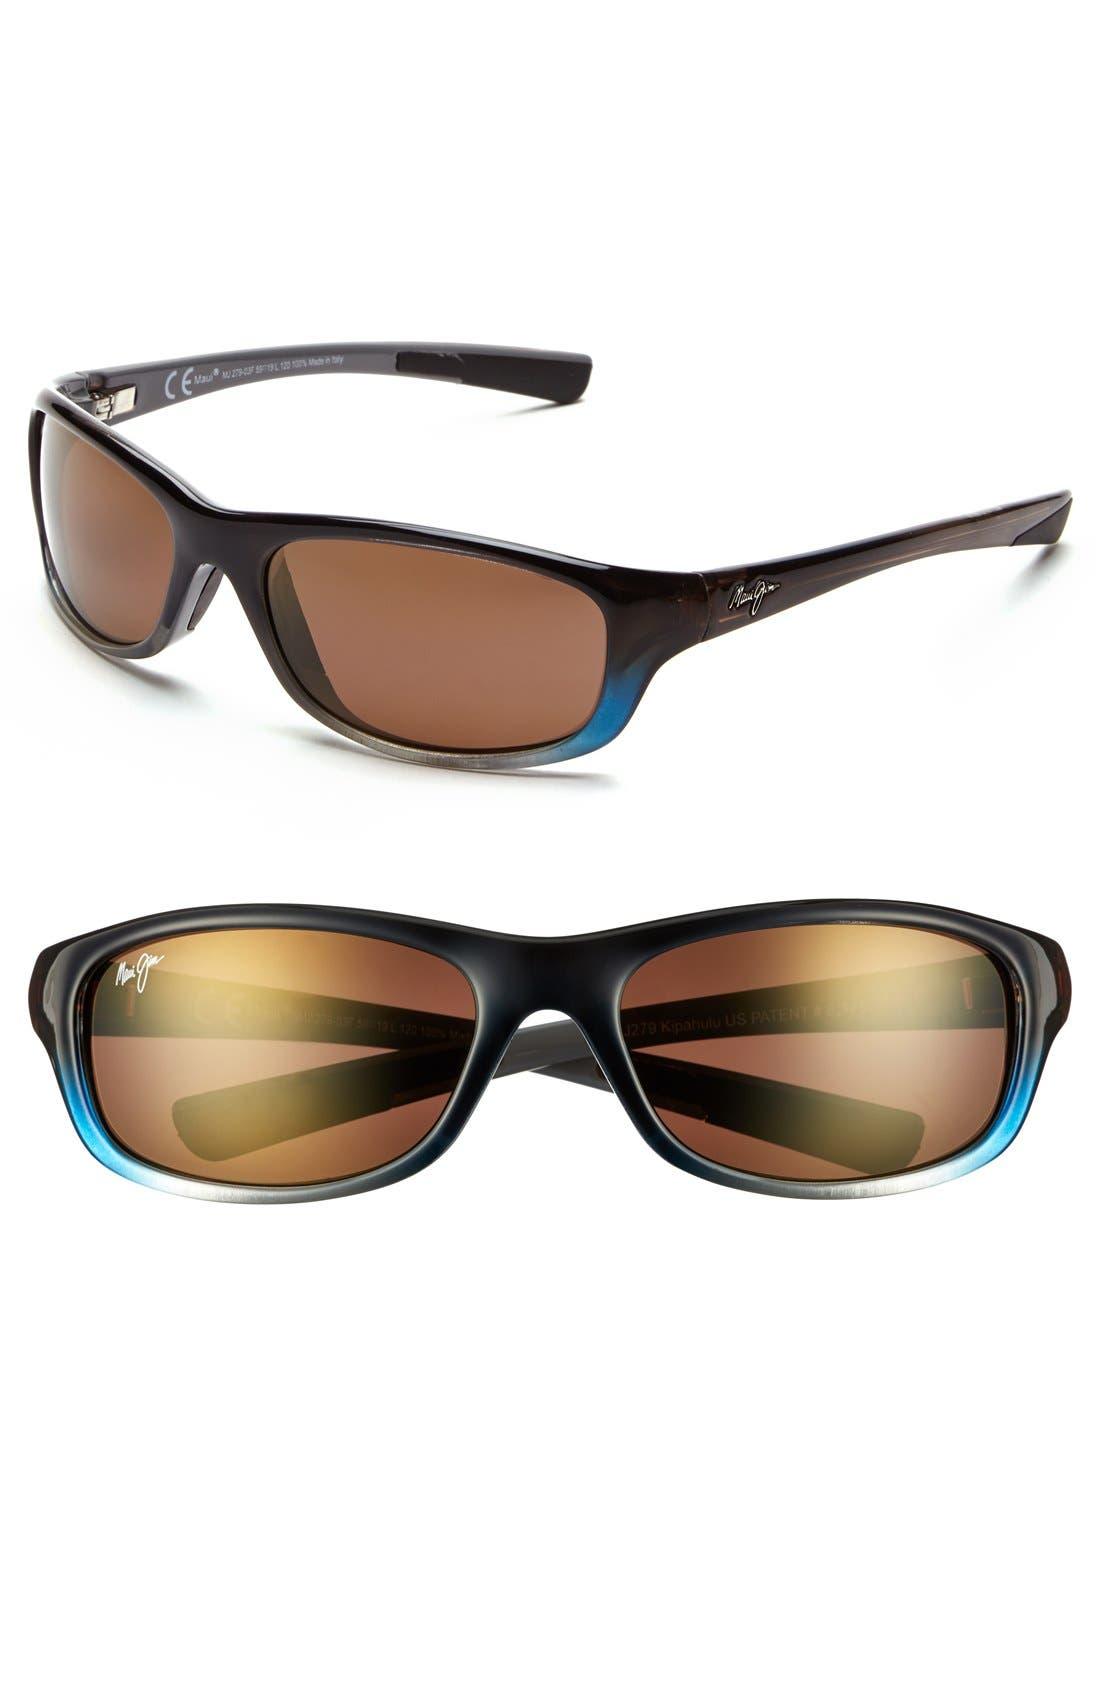 'Kipahulu - PolarizedPlus<sup>®</sup>2' 59mm Sunglasses,                             Main thumbnail 1, color,                             Marlin/ Hcl Bronze